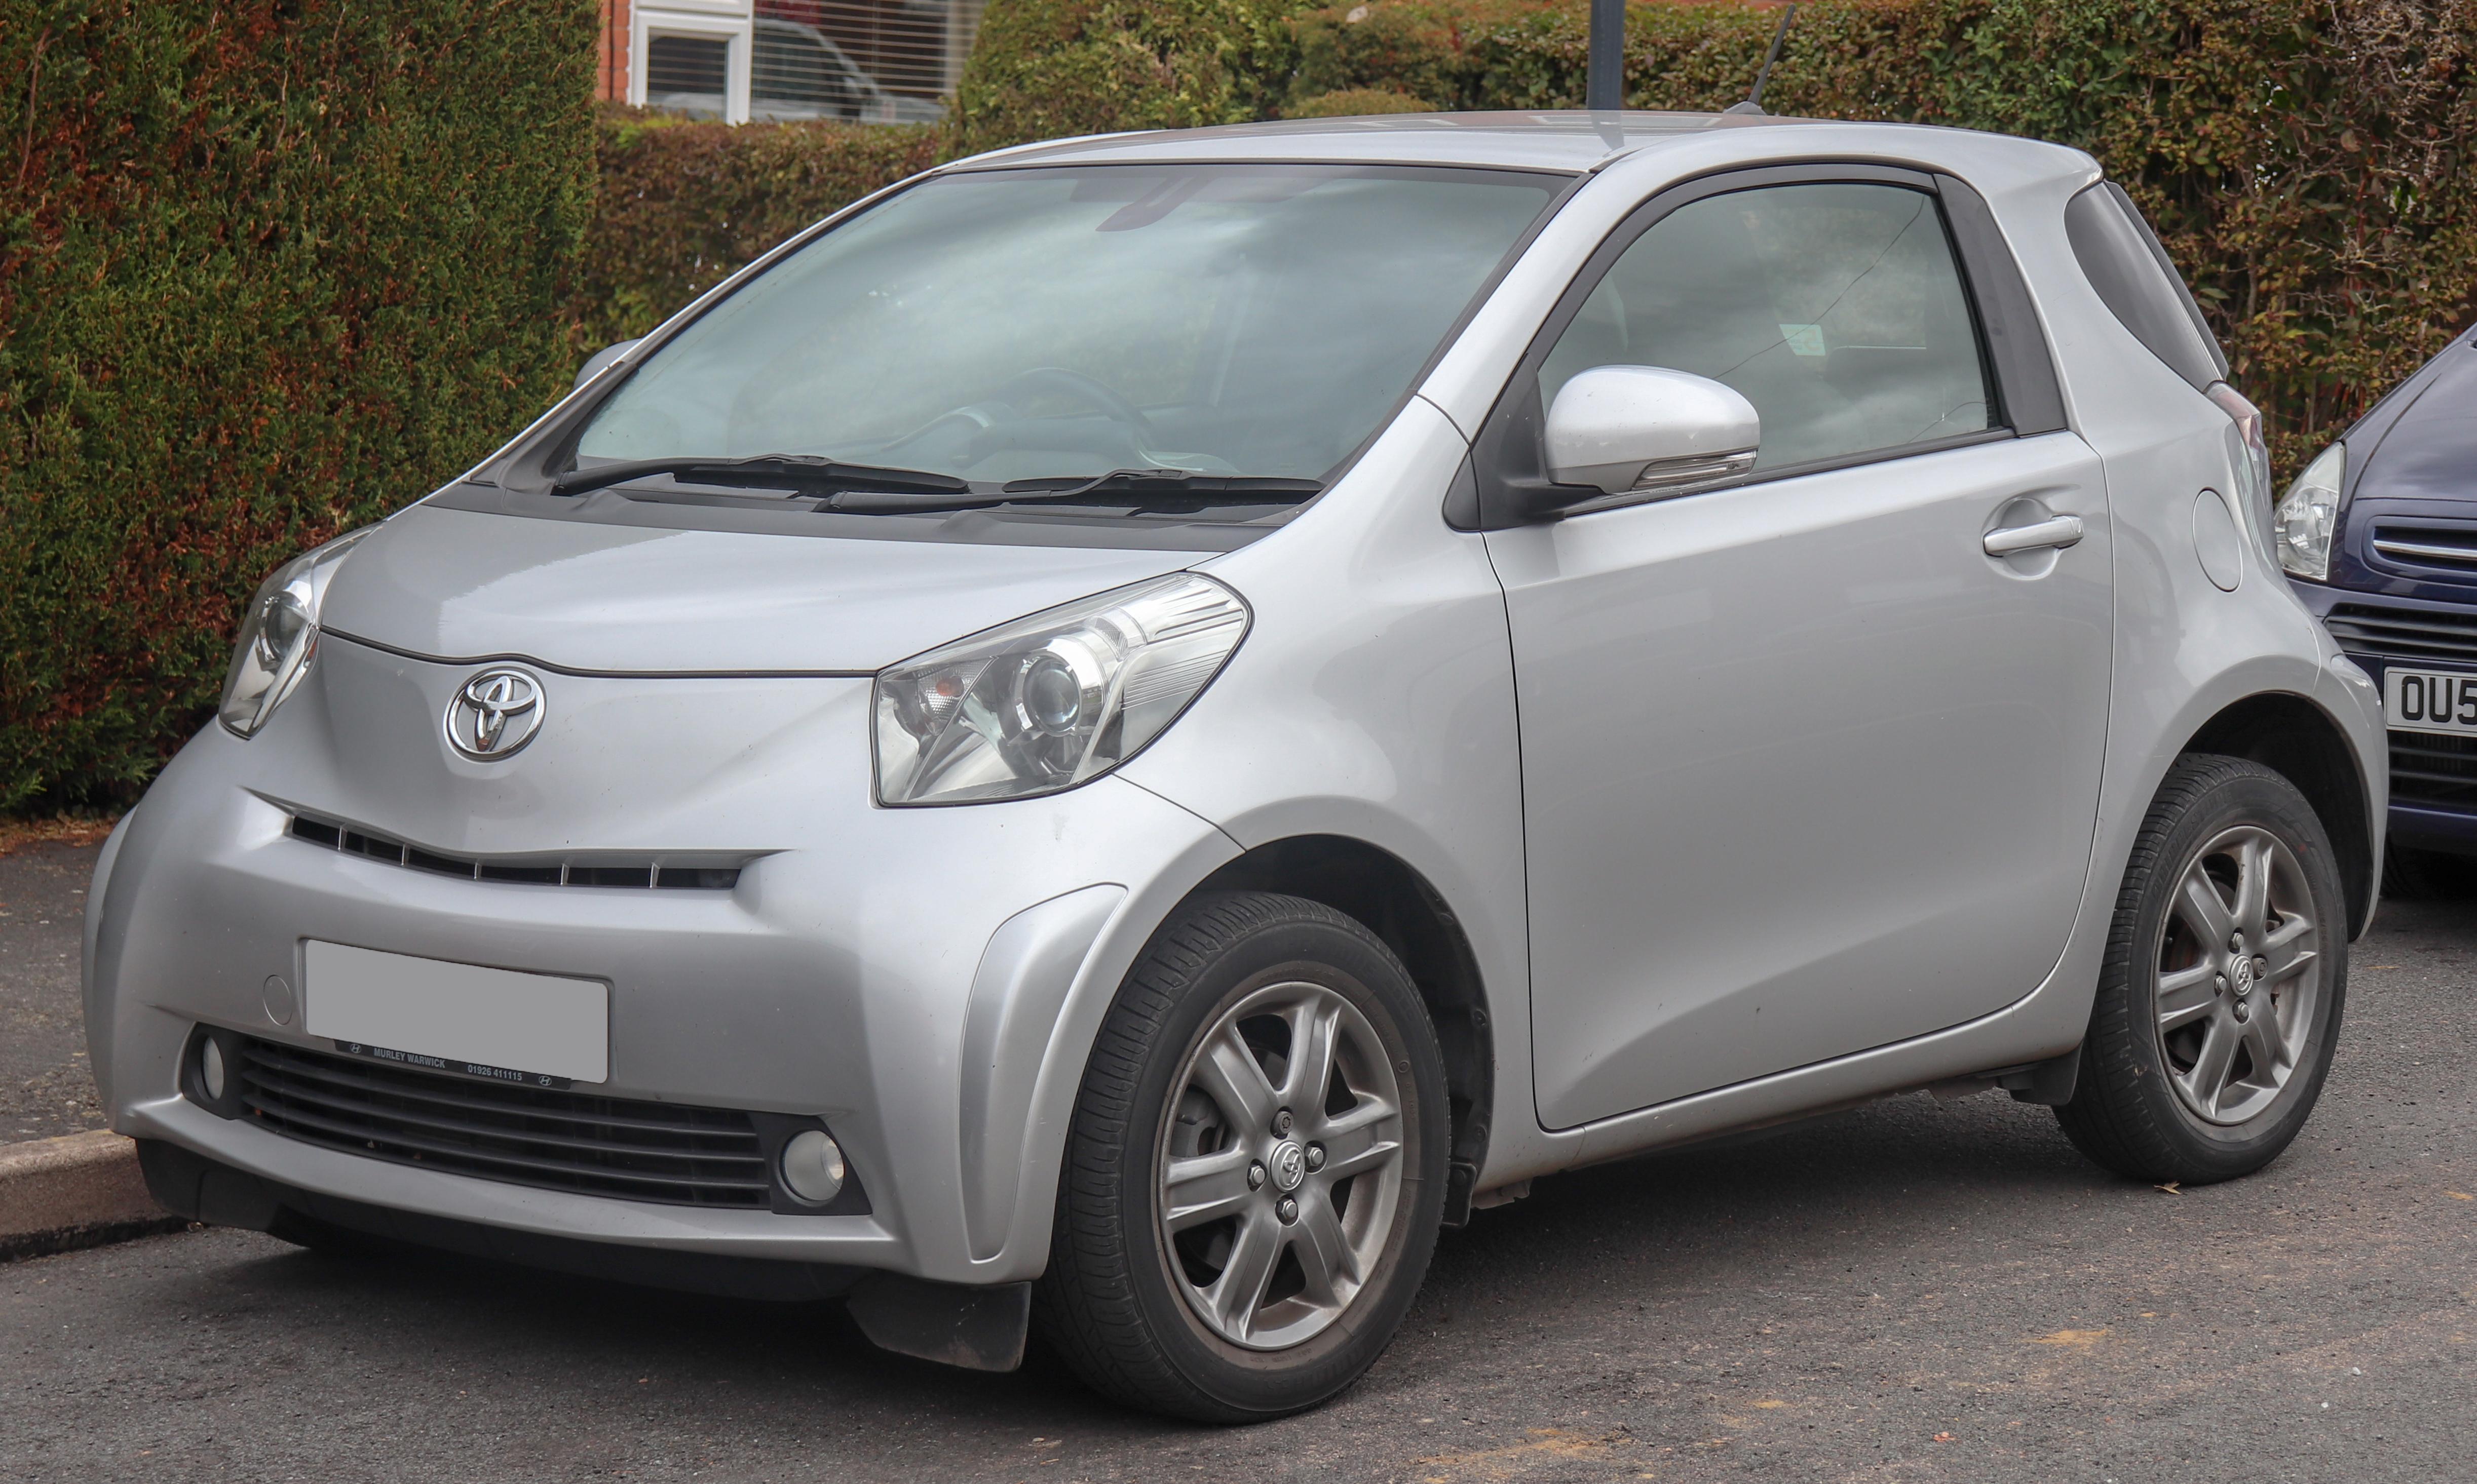 Kelebihan Kekurangan Toyota Q Top Model Tahun Ini